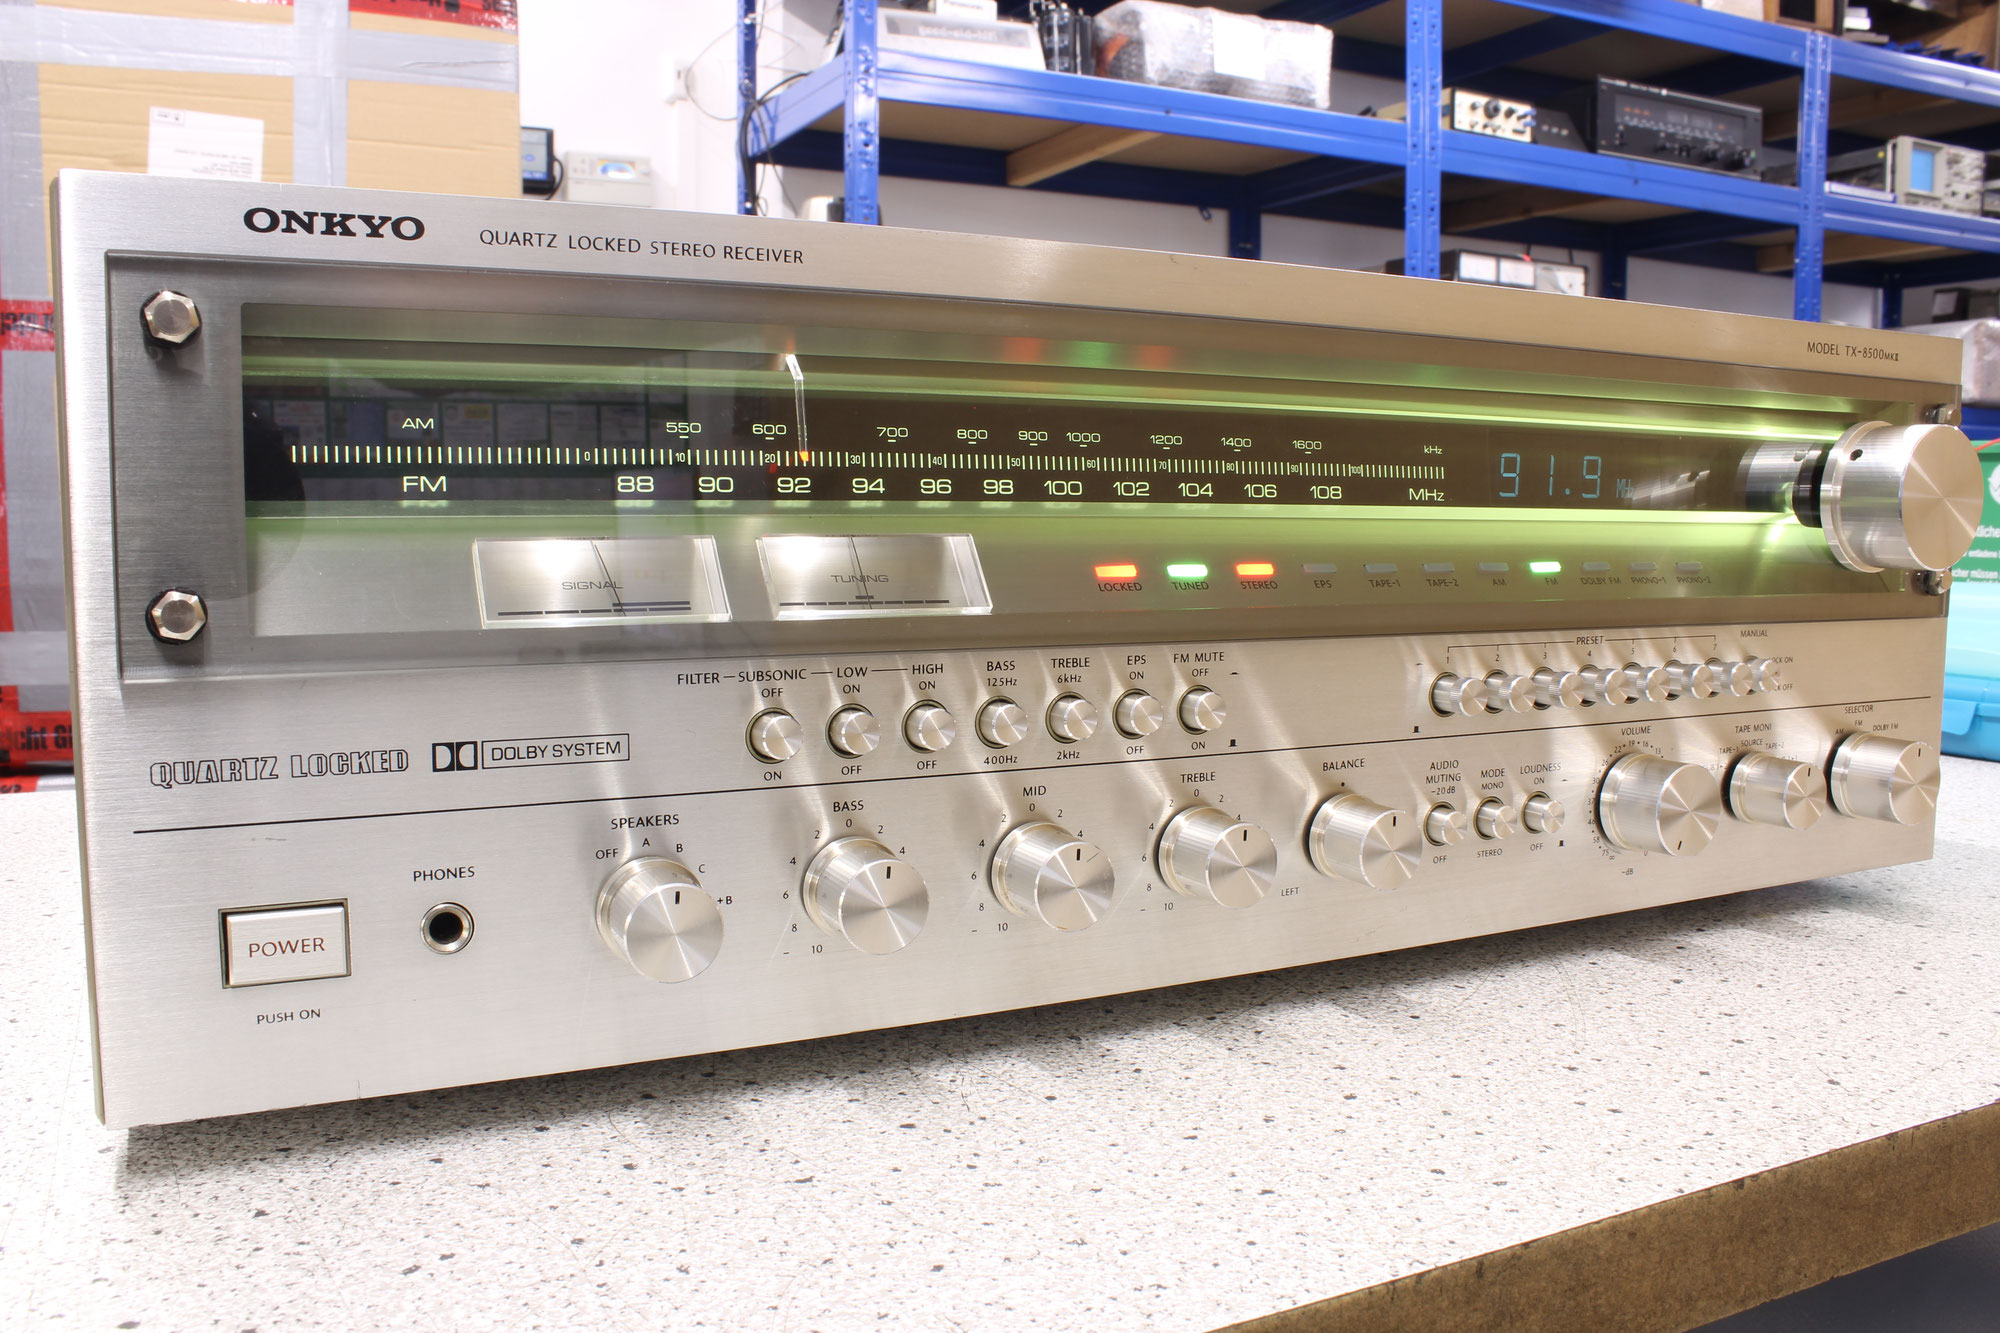 Onkyo TX-8500MKII